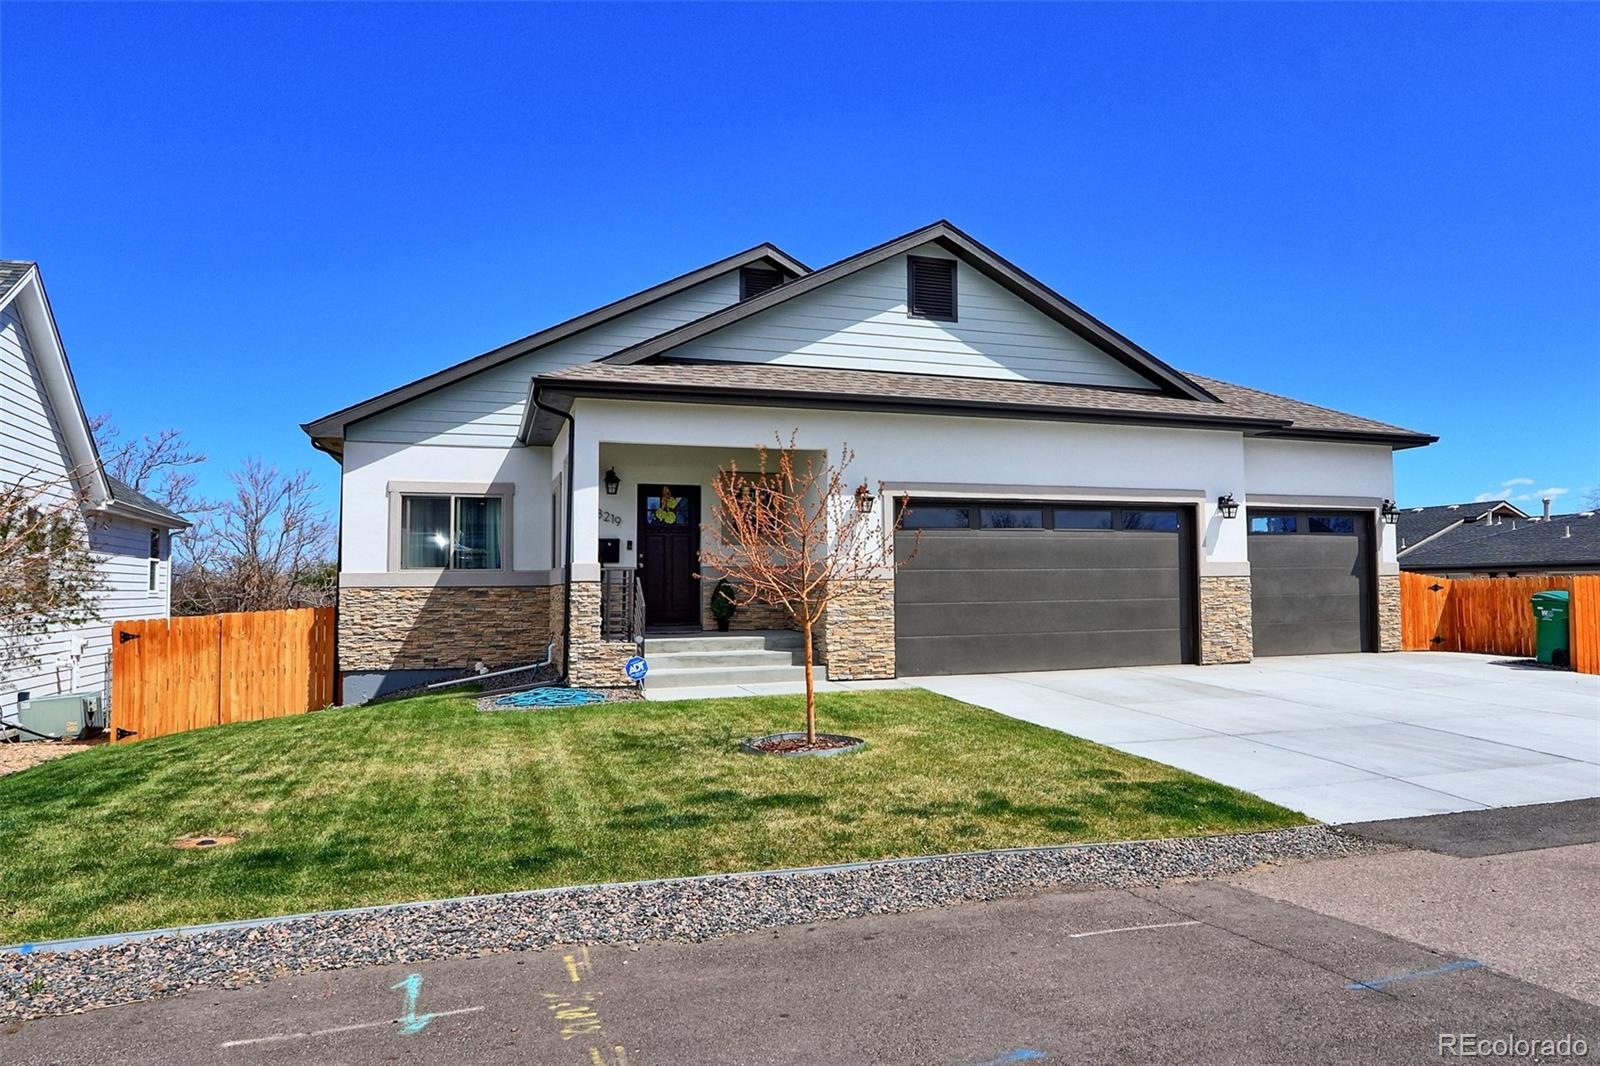 8219 W Mexico Avenue, Lakewood, CO 80232 - Lakewood, CO real estate listing